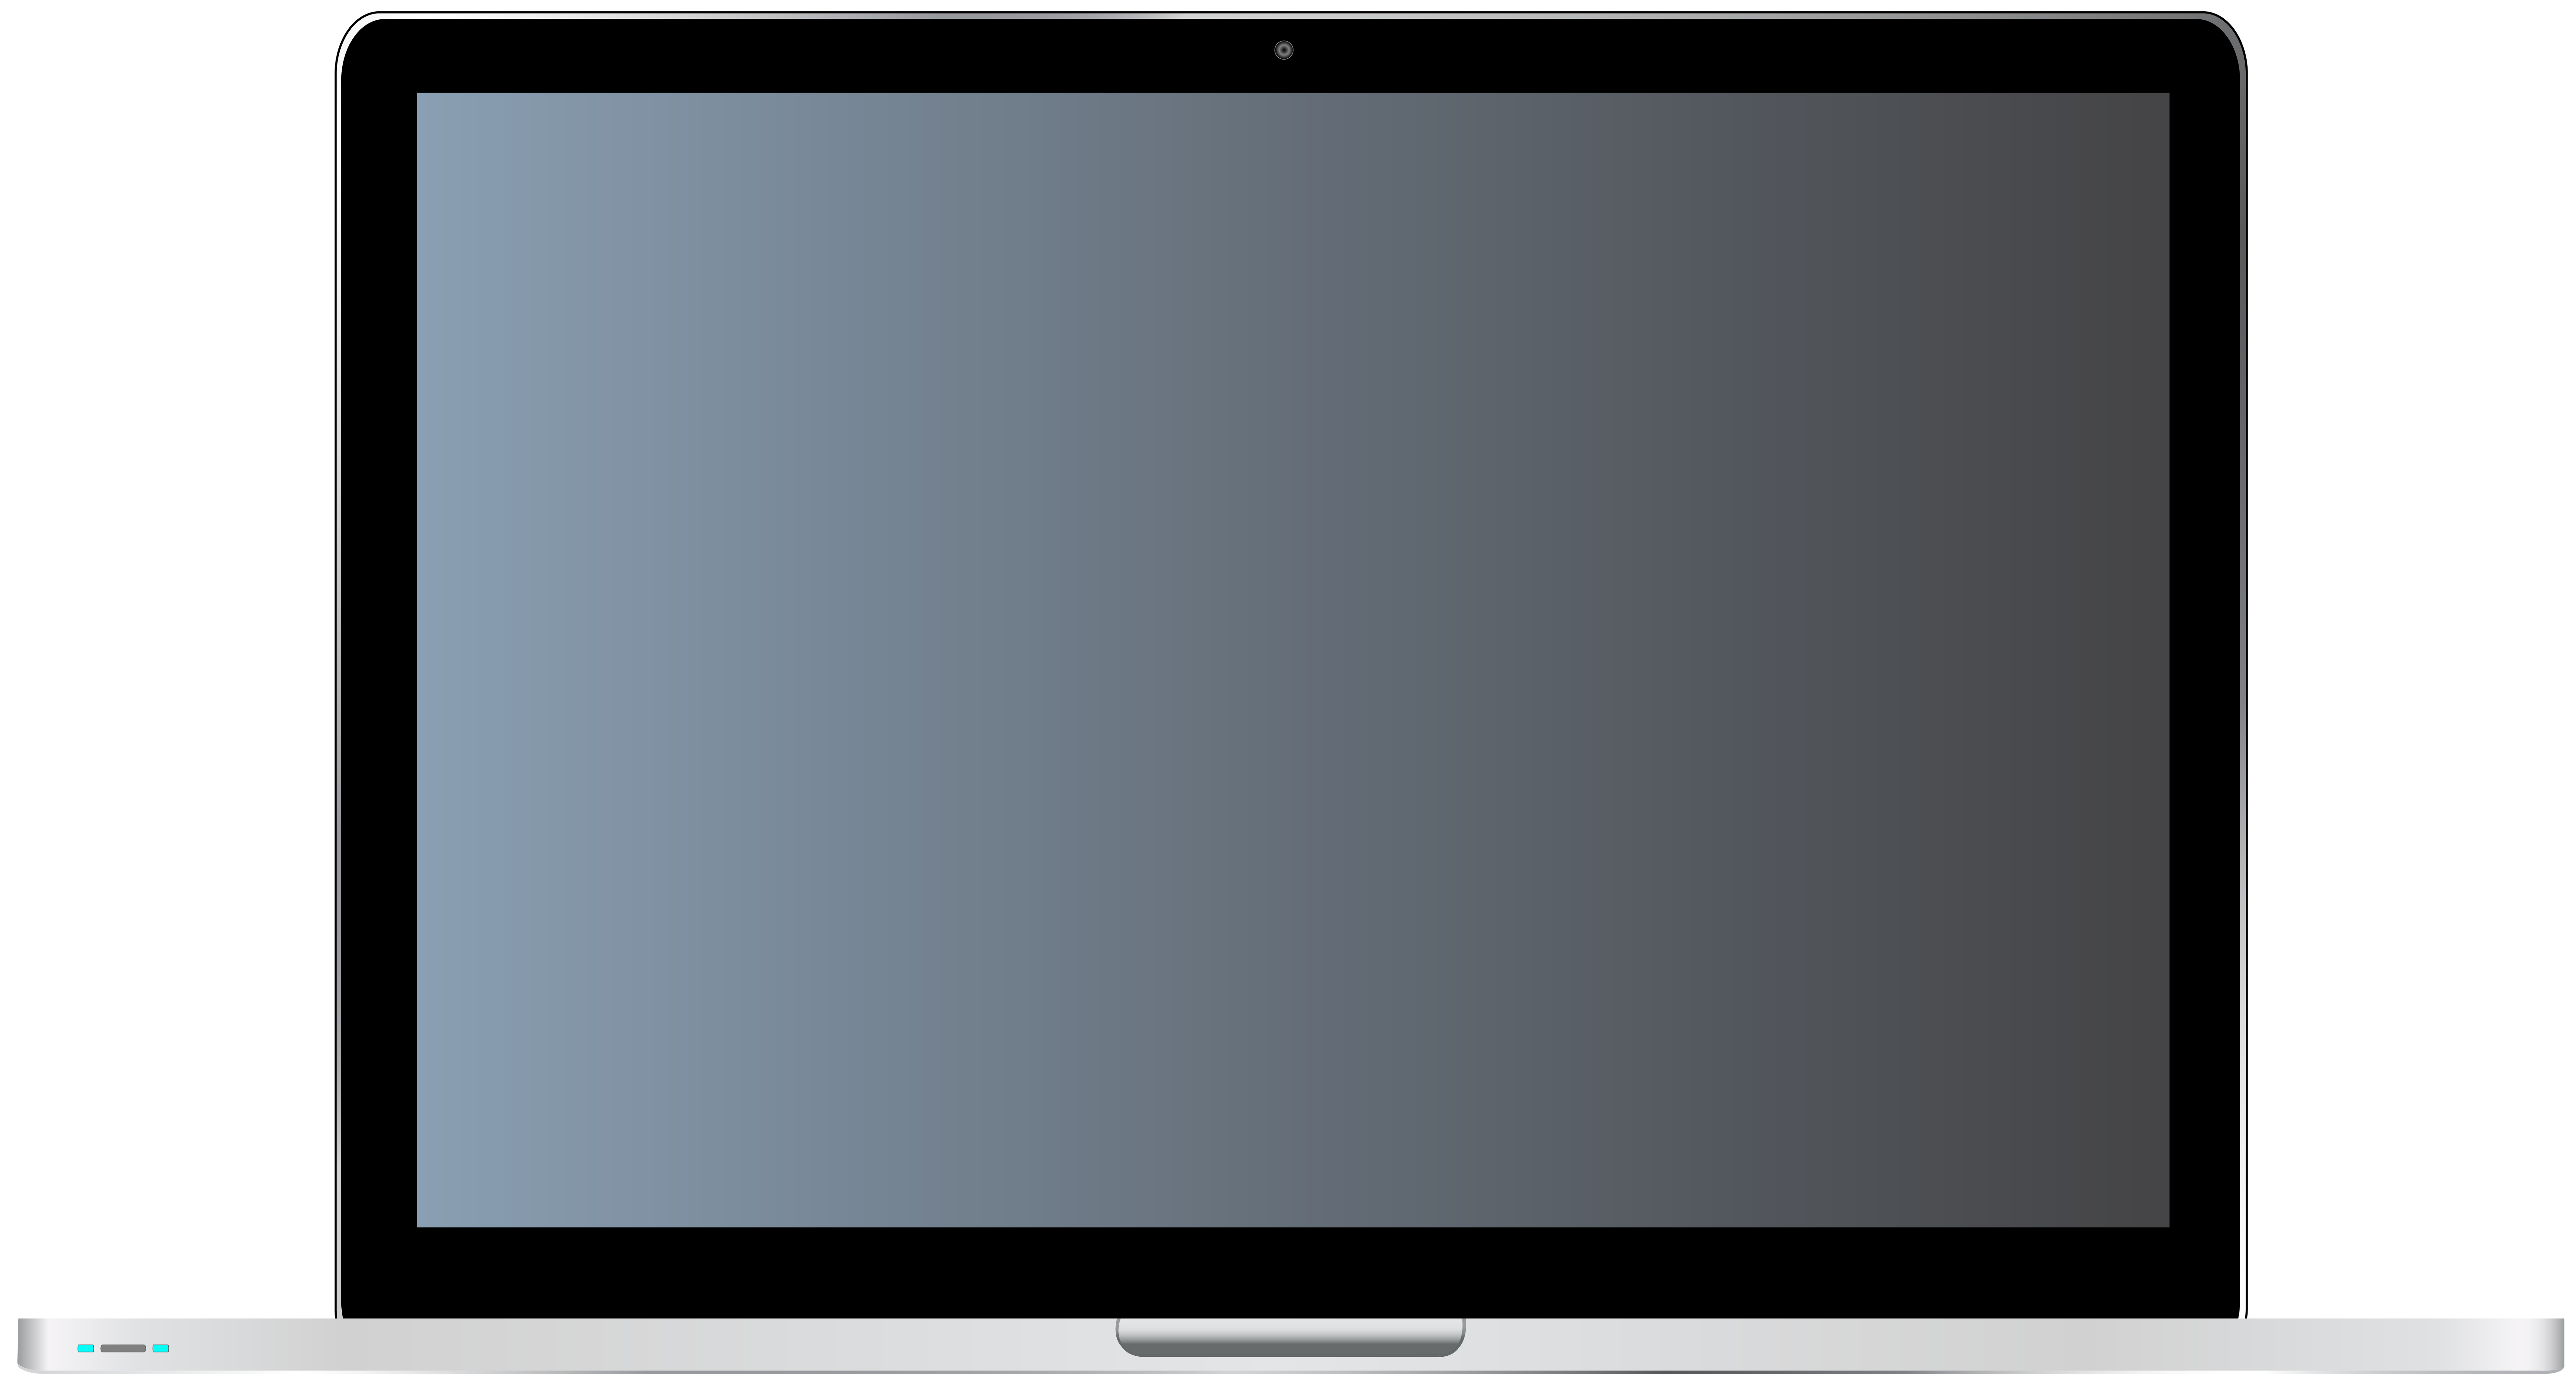 Laptop frame clipart clip art freeuse Laptop Transparent PNG Clip Art | Gallery Yopriceville - High ... clip art freeuse